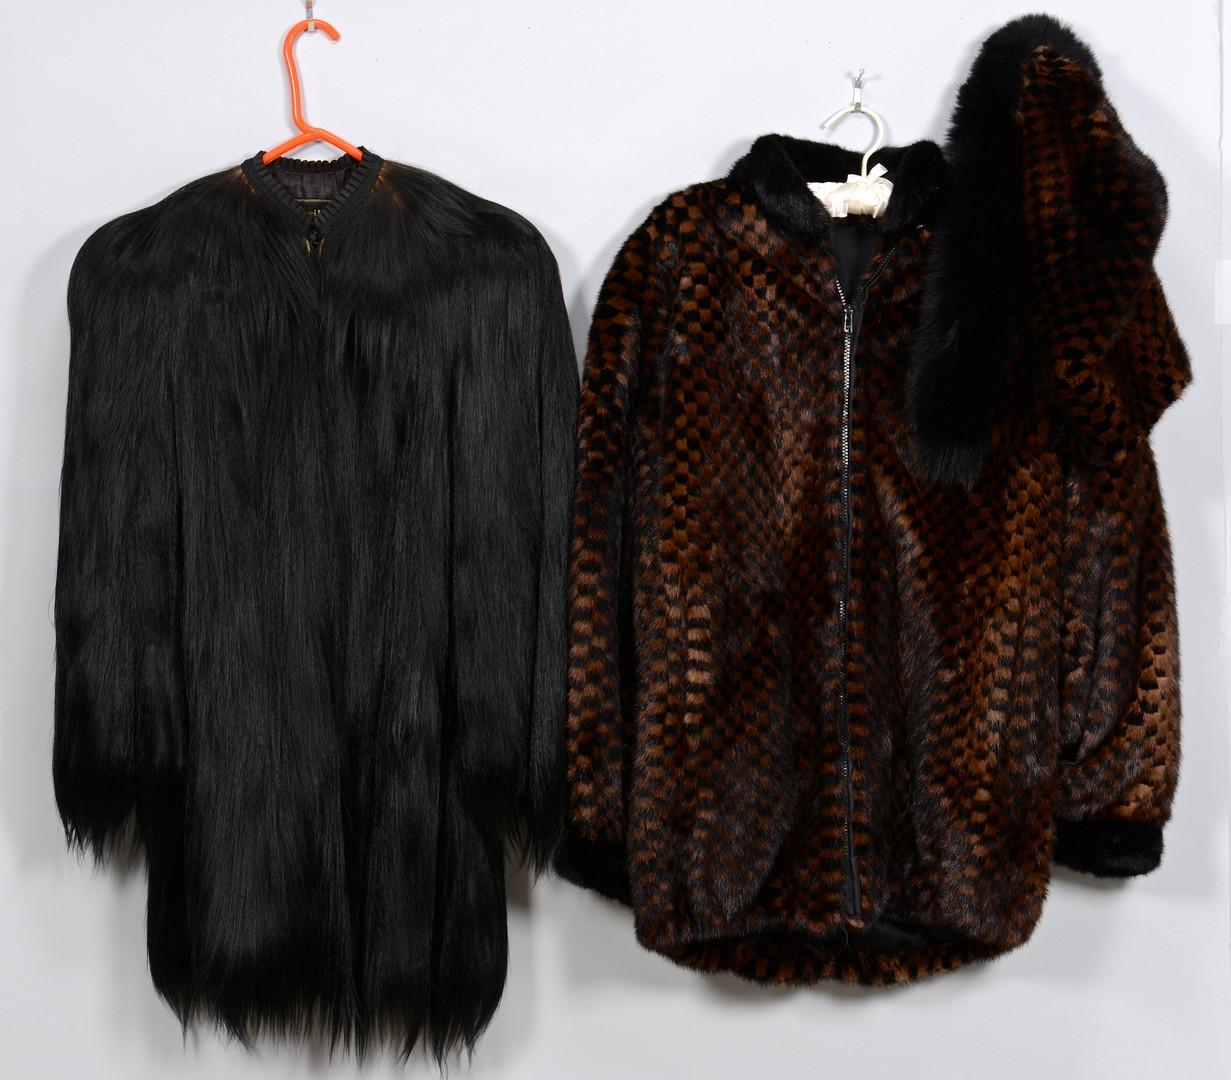 Lot 837: 2 Ladies Fur Coats, 1 Monkey Fur